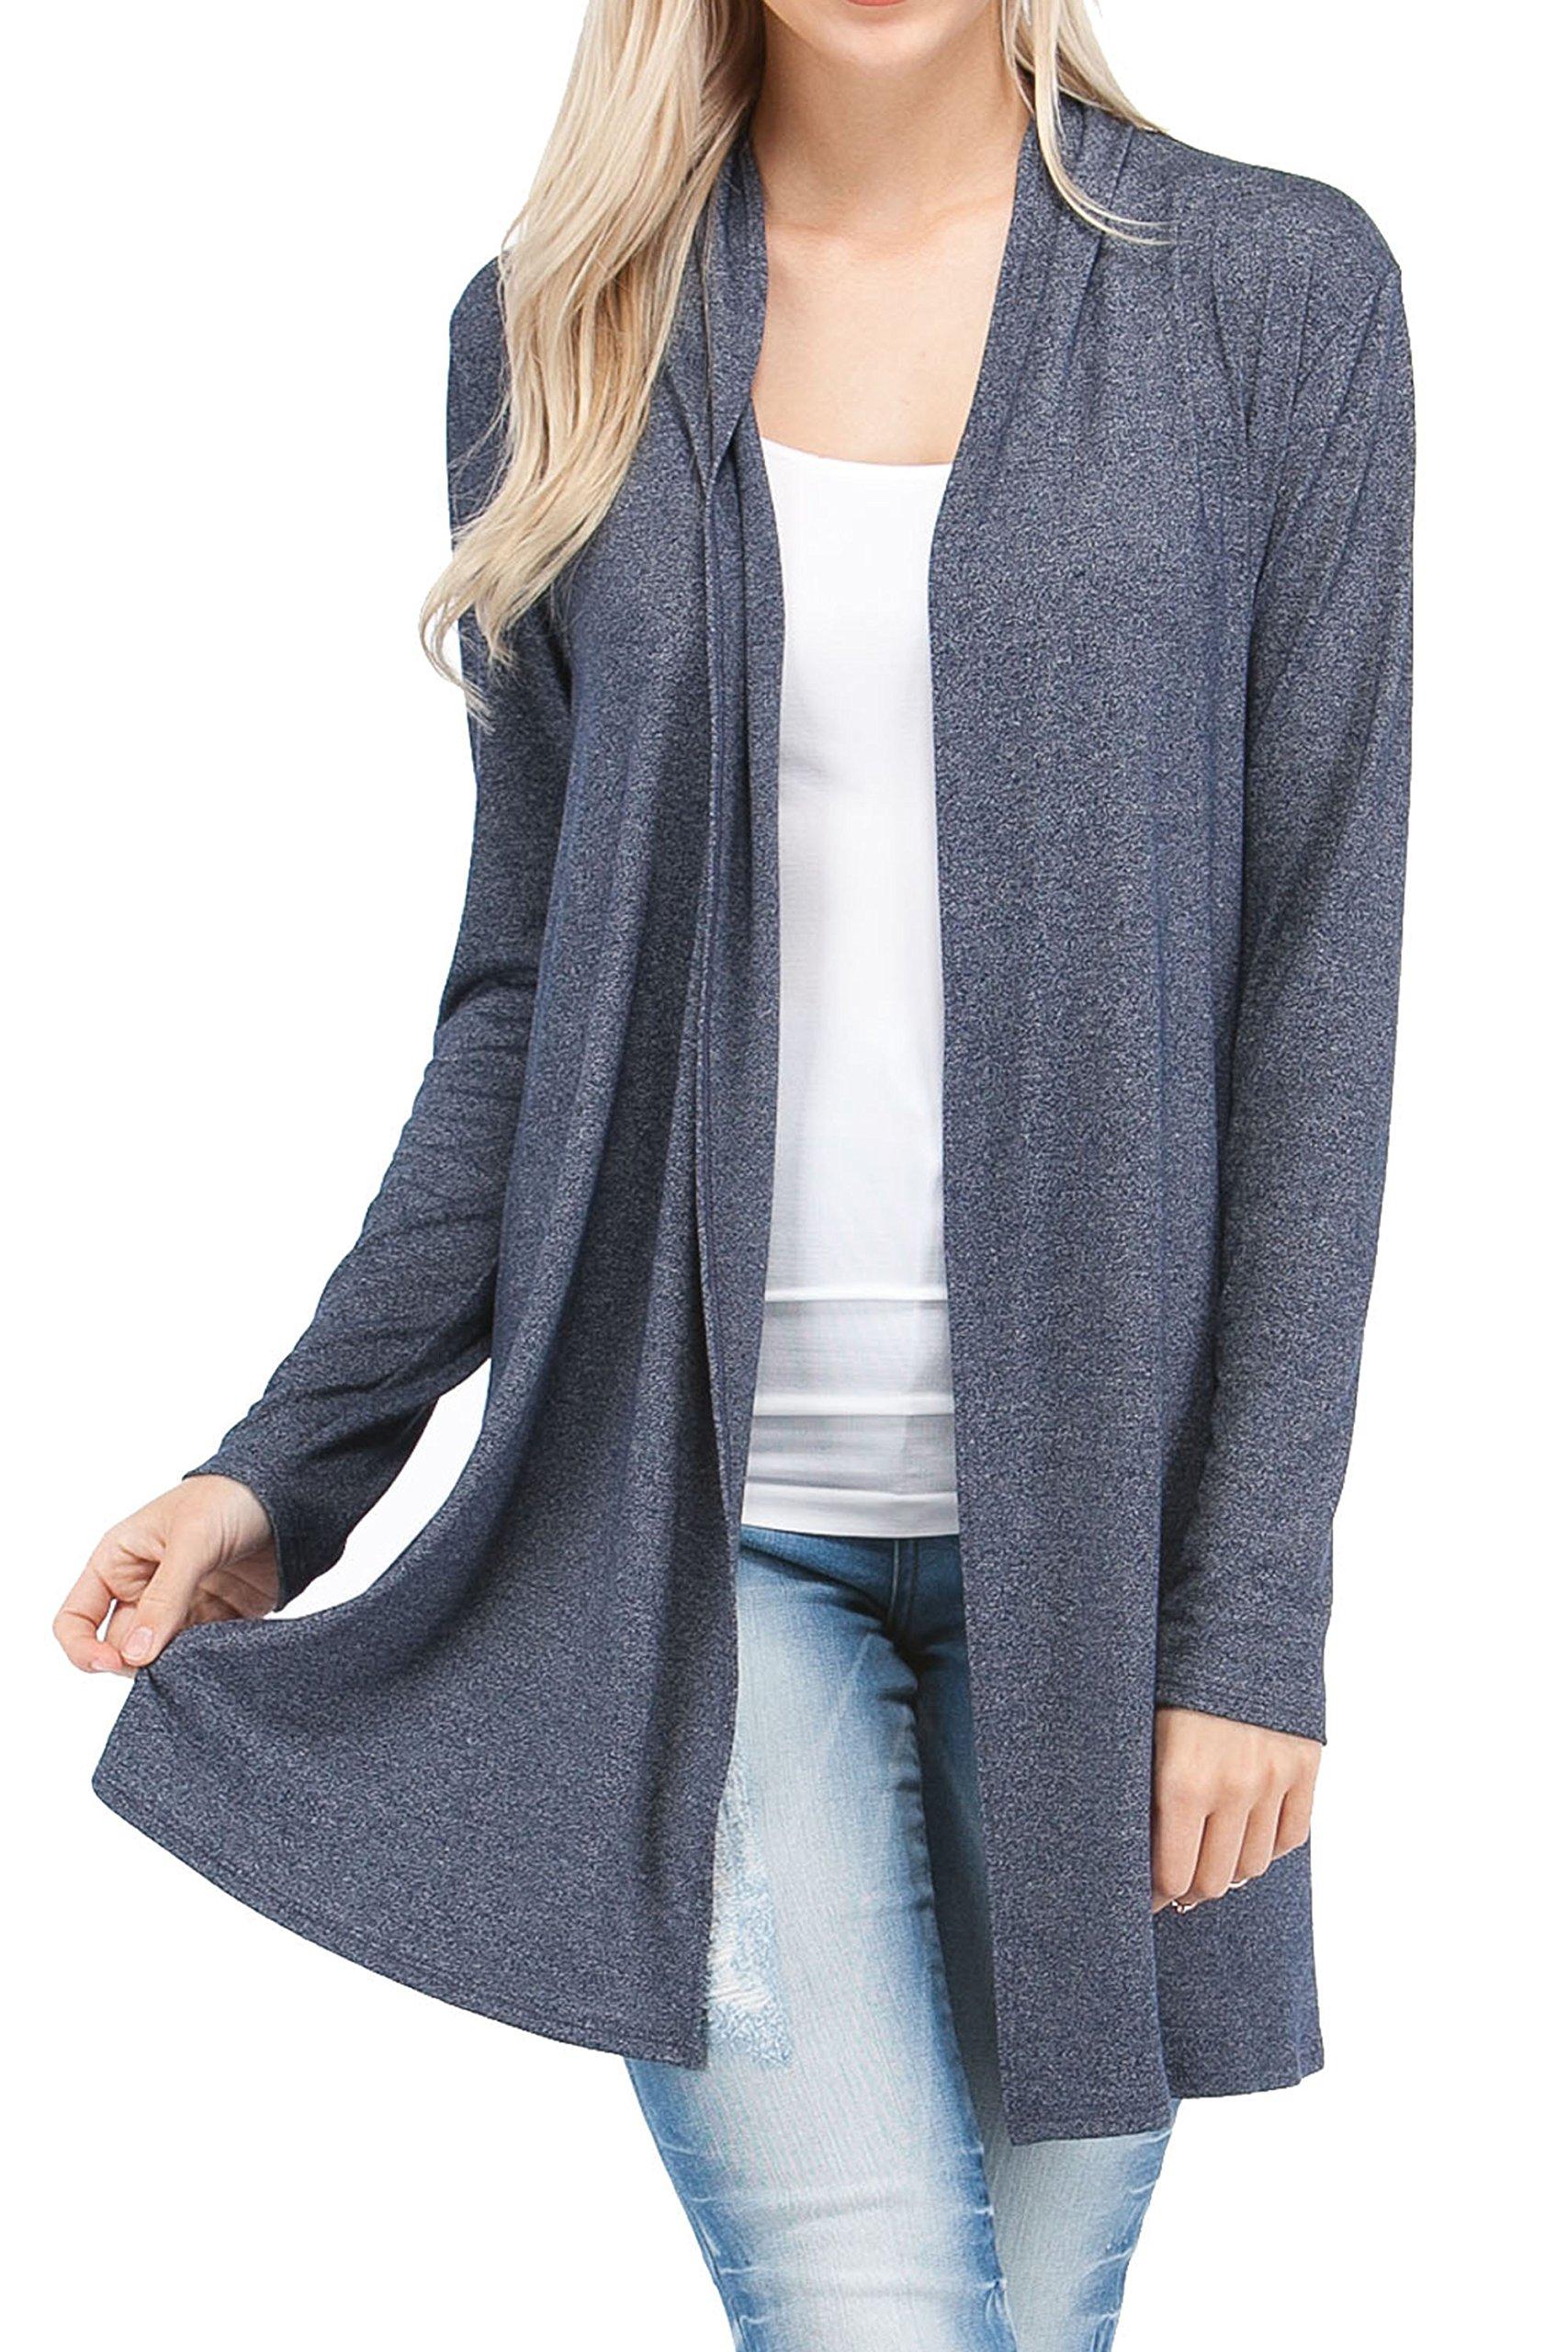 EttelLut Long Open Front Lightweight Soft Knit L/Sleeve long cardigans for women plus size Navy XXL